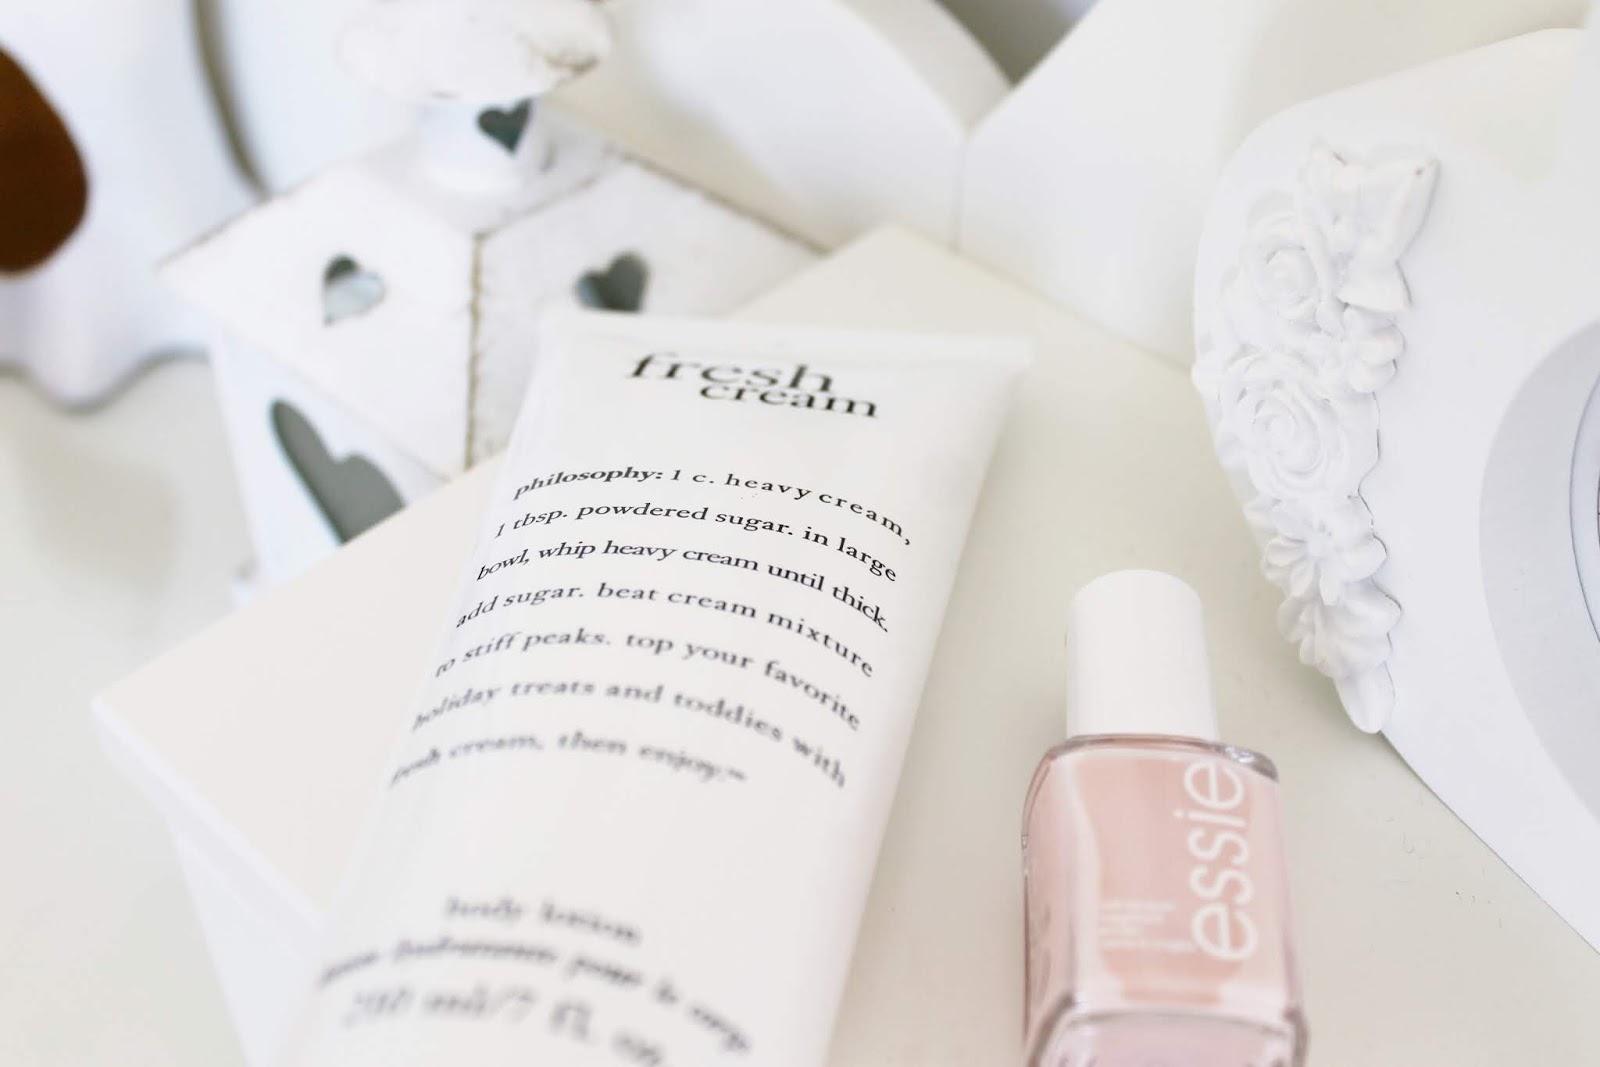 Modern day princess things, self care beauty rituals